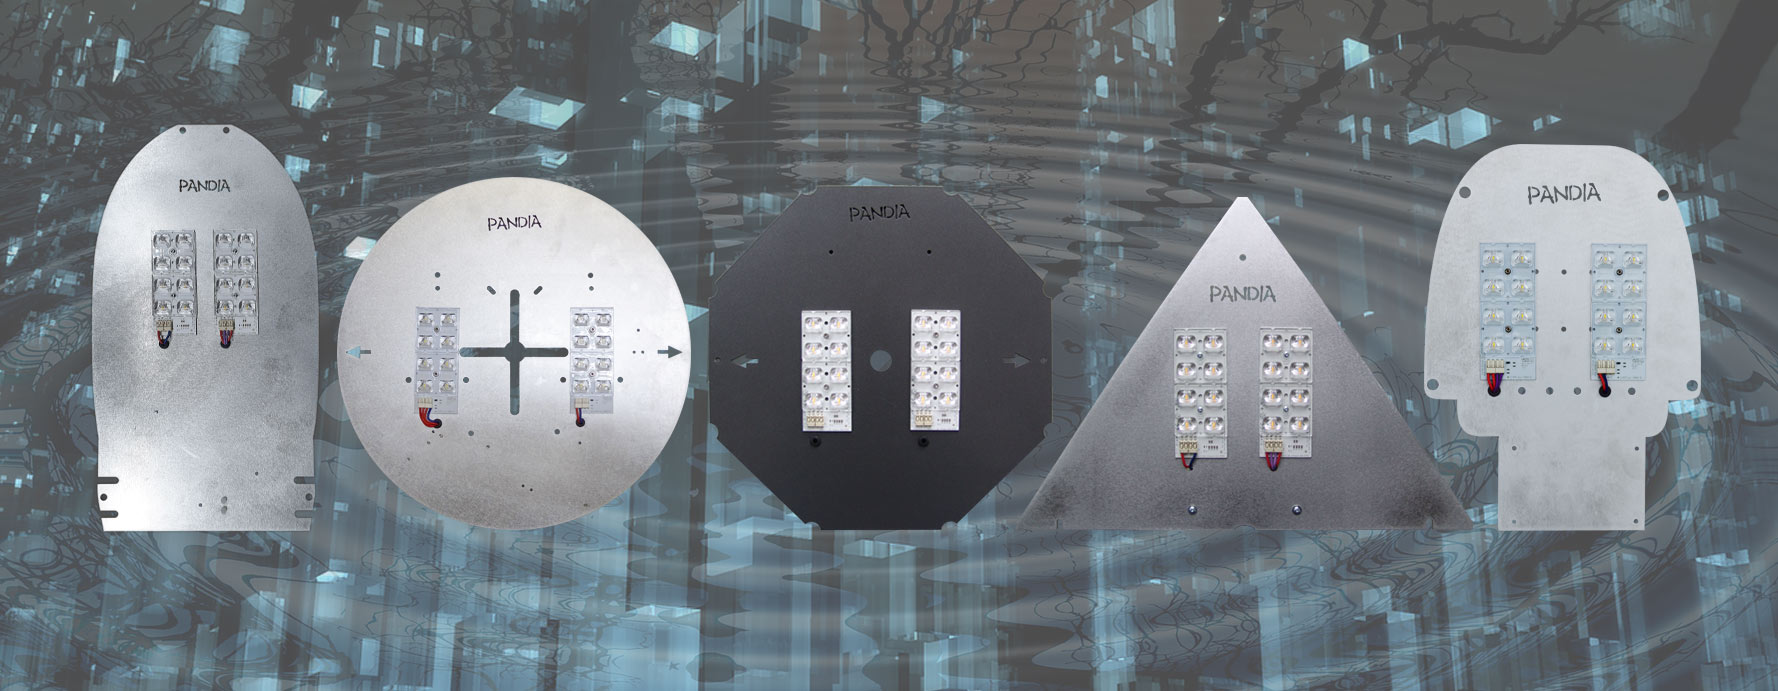 Form ist eine Variable - Pandia Plato LED Umrüstsätze